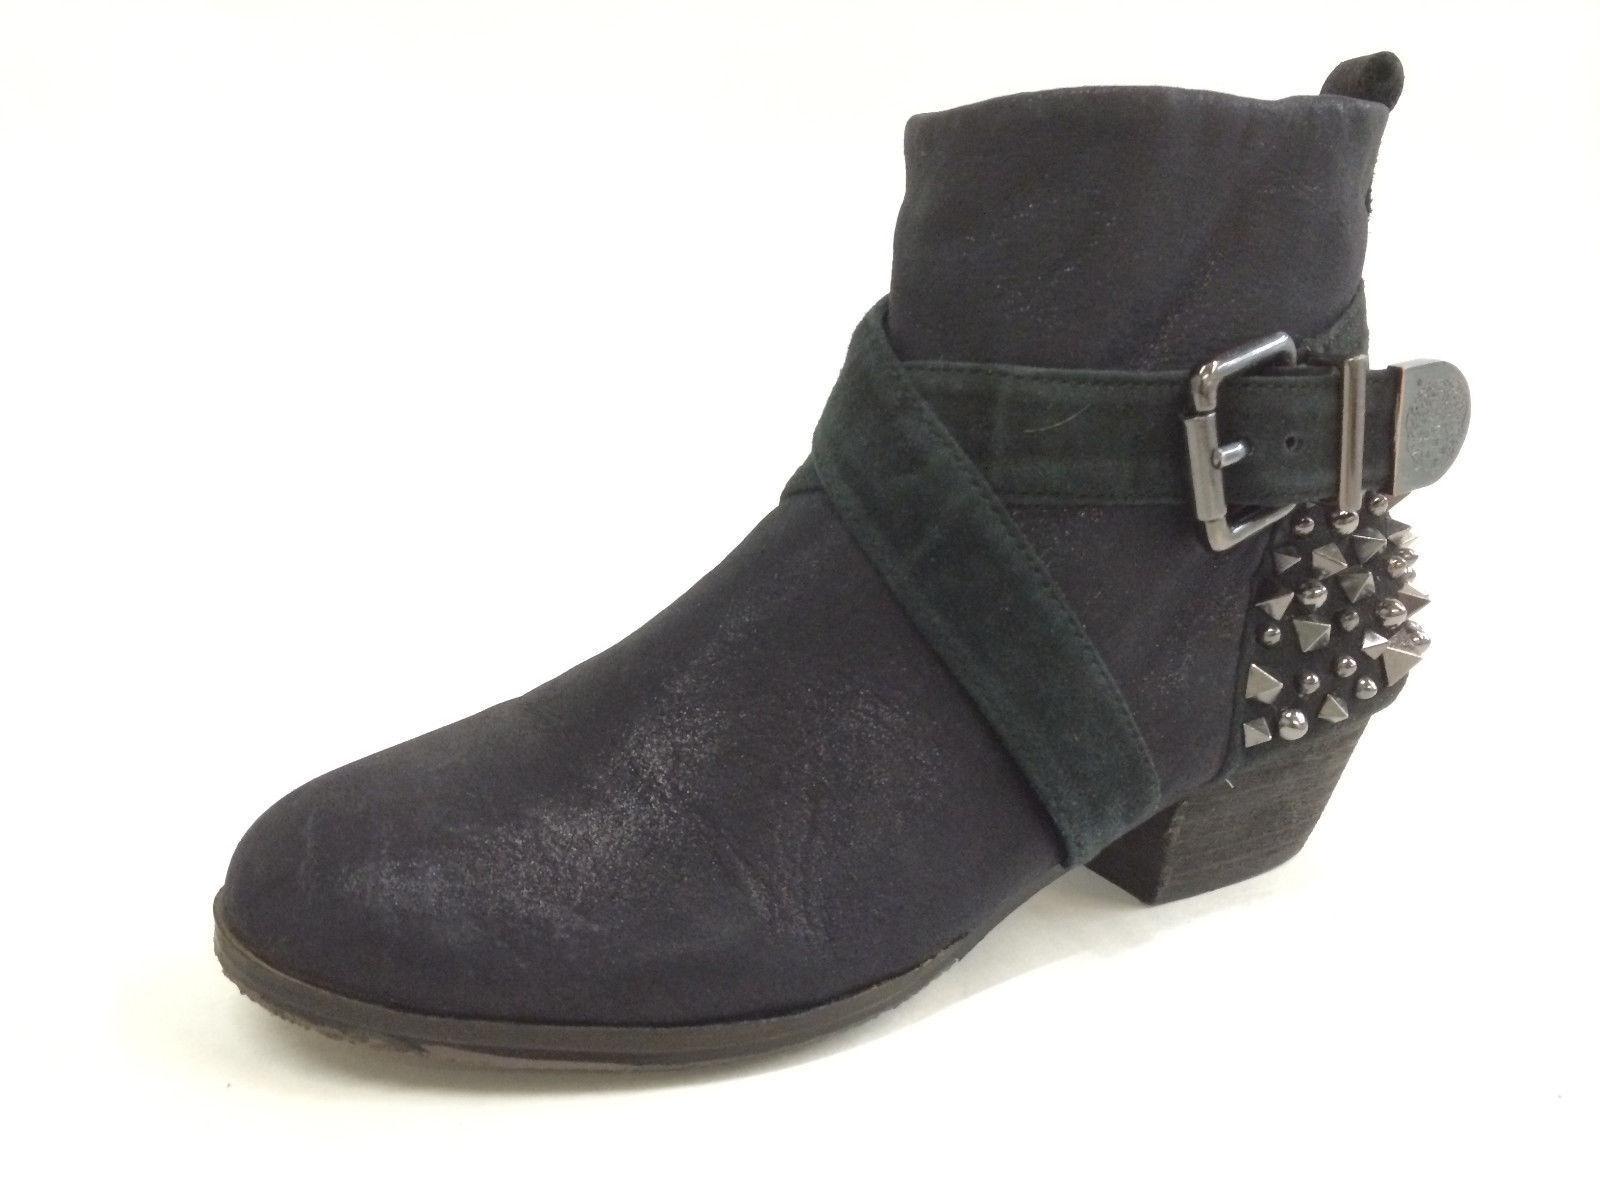 Damens's schuhe Vince Camuto ankle boots schwarz Größe 6.5 M